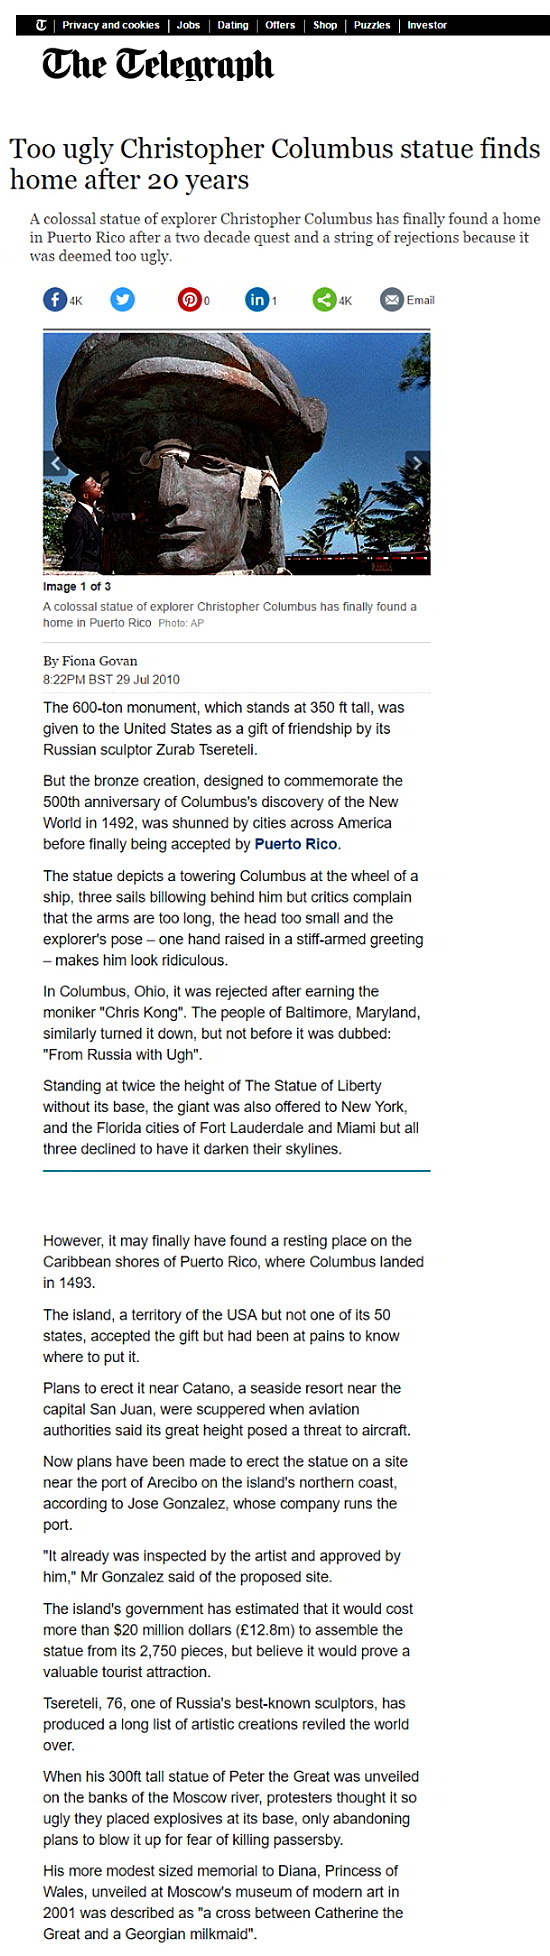 Estatua Cristóbal Colón fea encuentra hogar, tomo 20 años-Autogiro arte actual